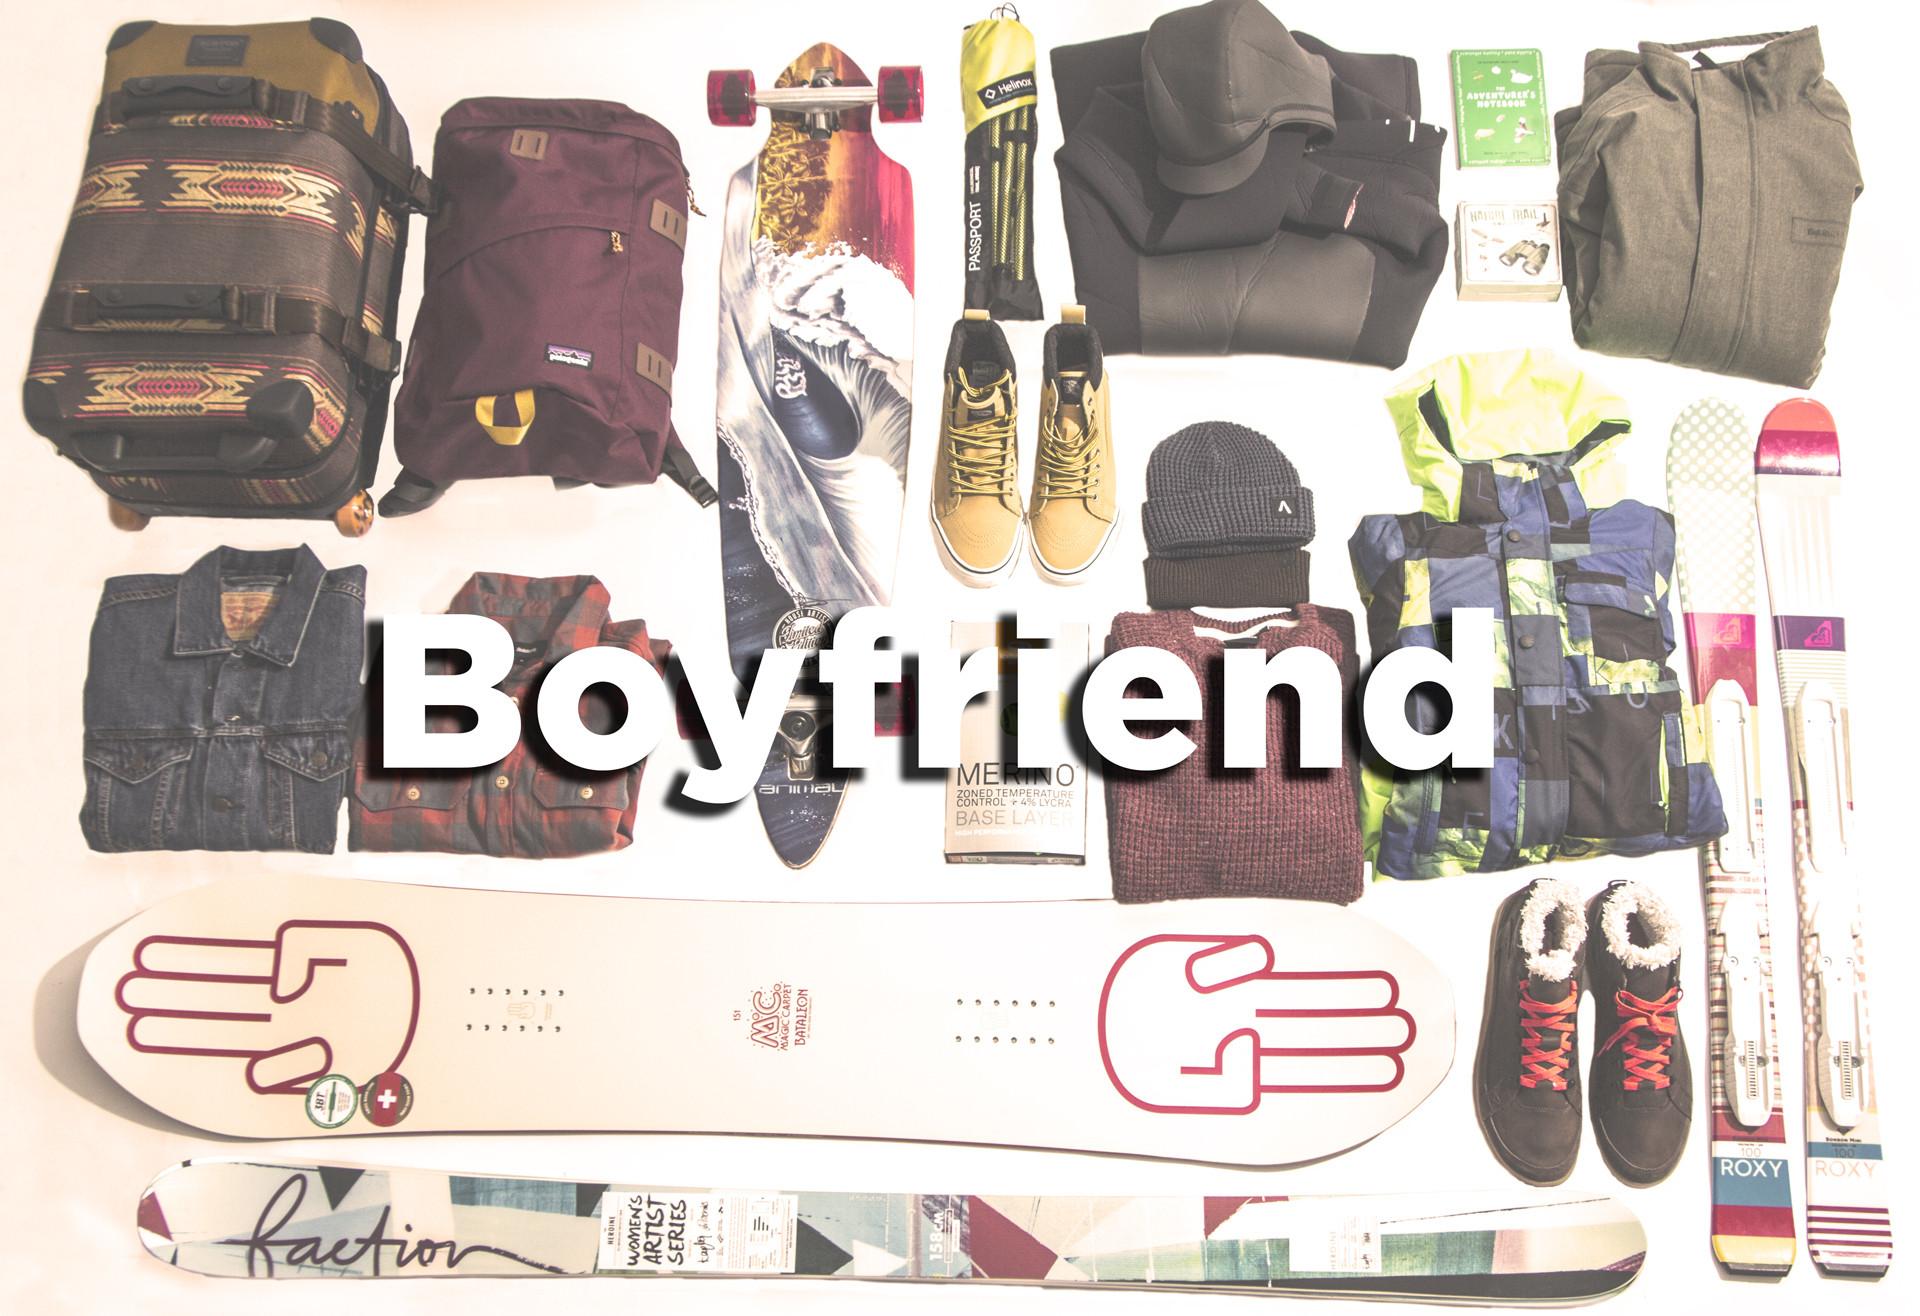 Boyfriend Christmas Gift Ideas  Christmas Gift Ideas For A Boyfriend 15 Great Gifts